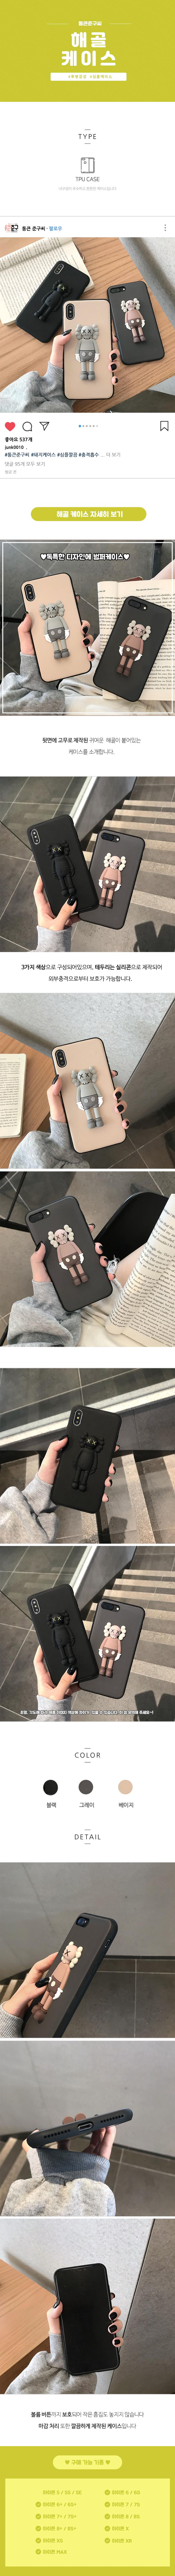 Skeleton case